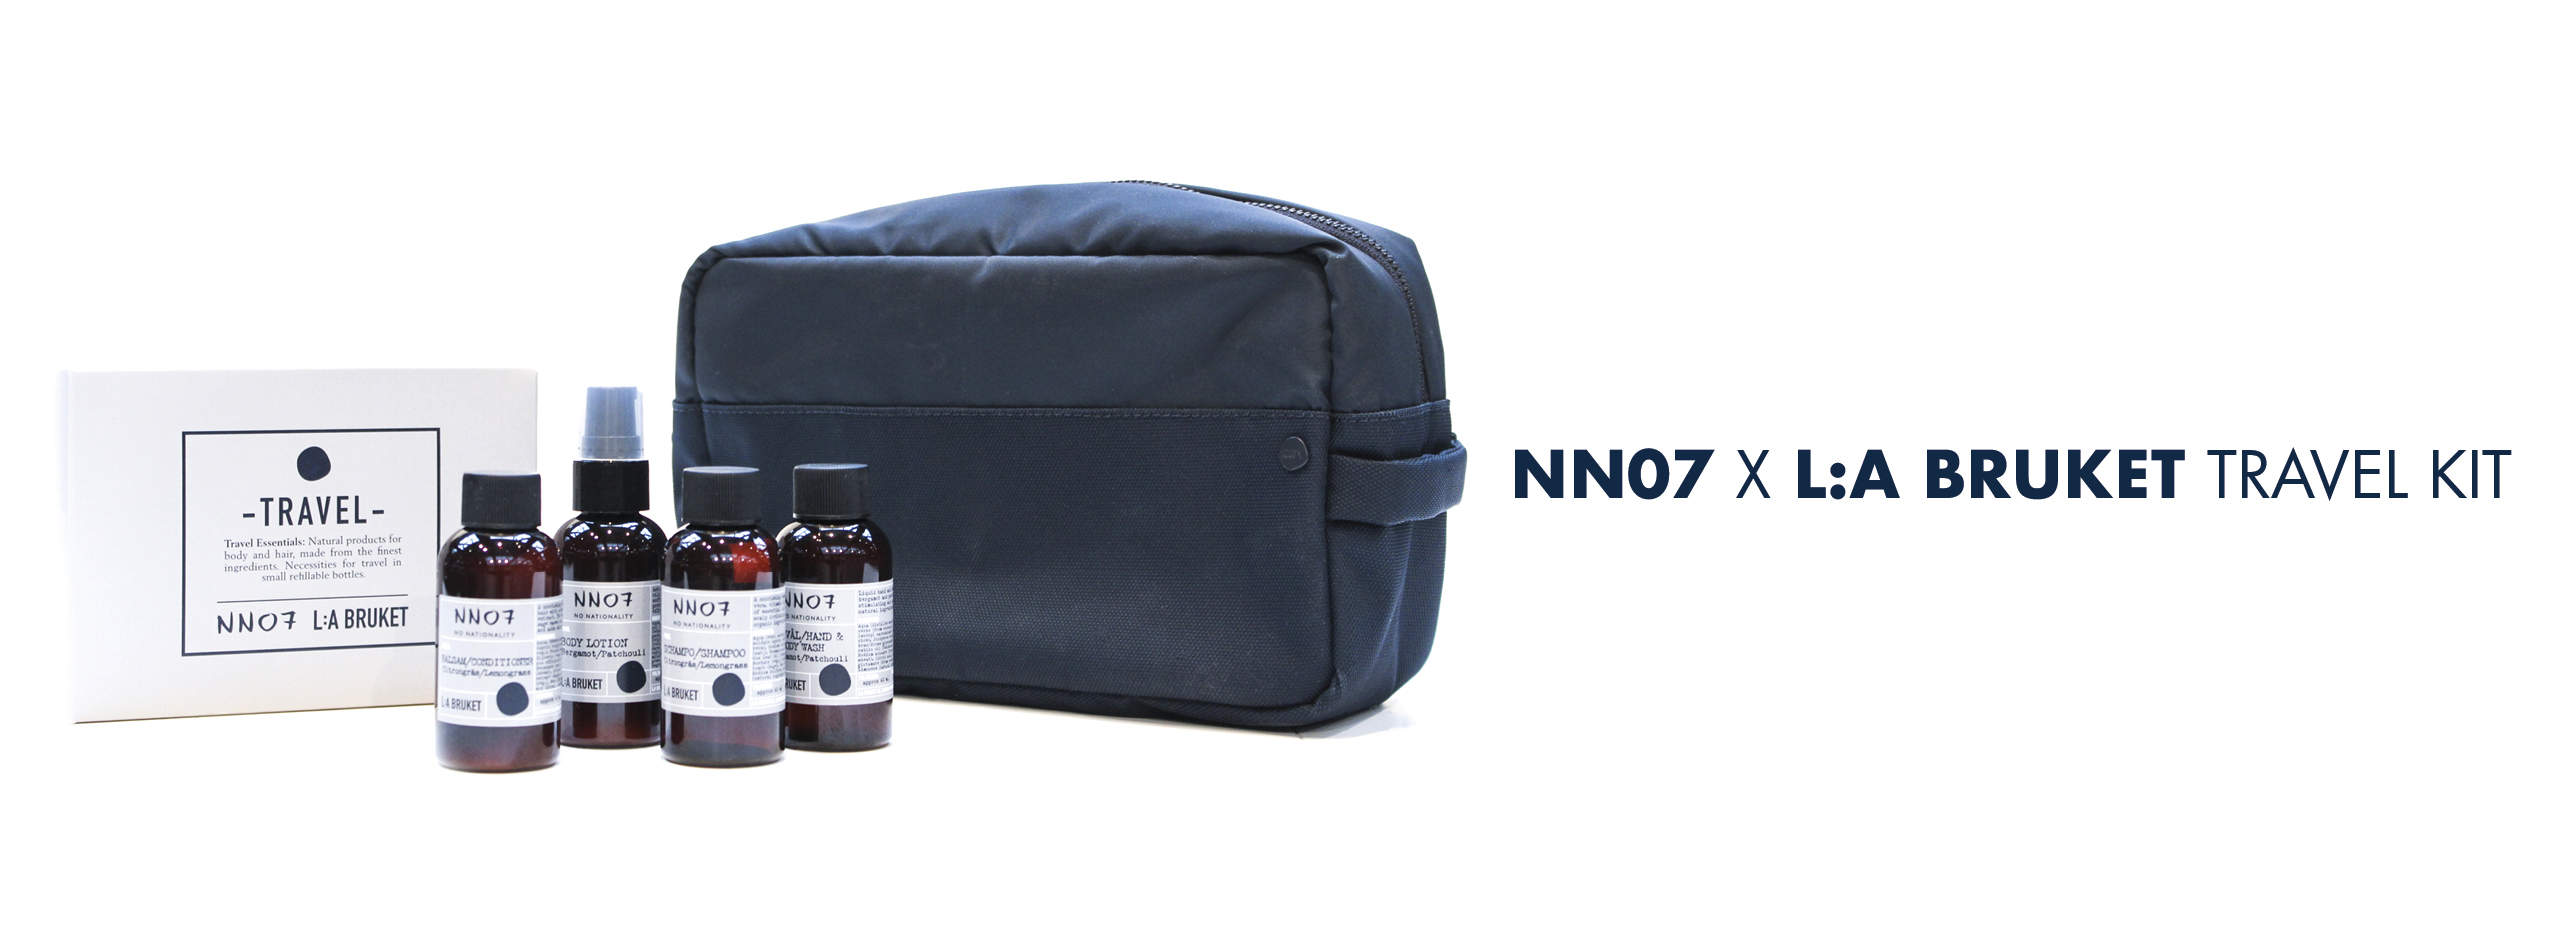 NN07 X L:A BRUKET